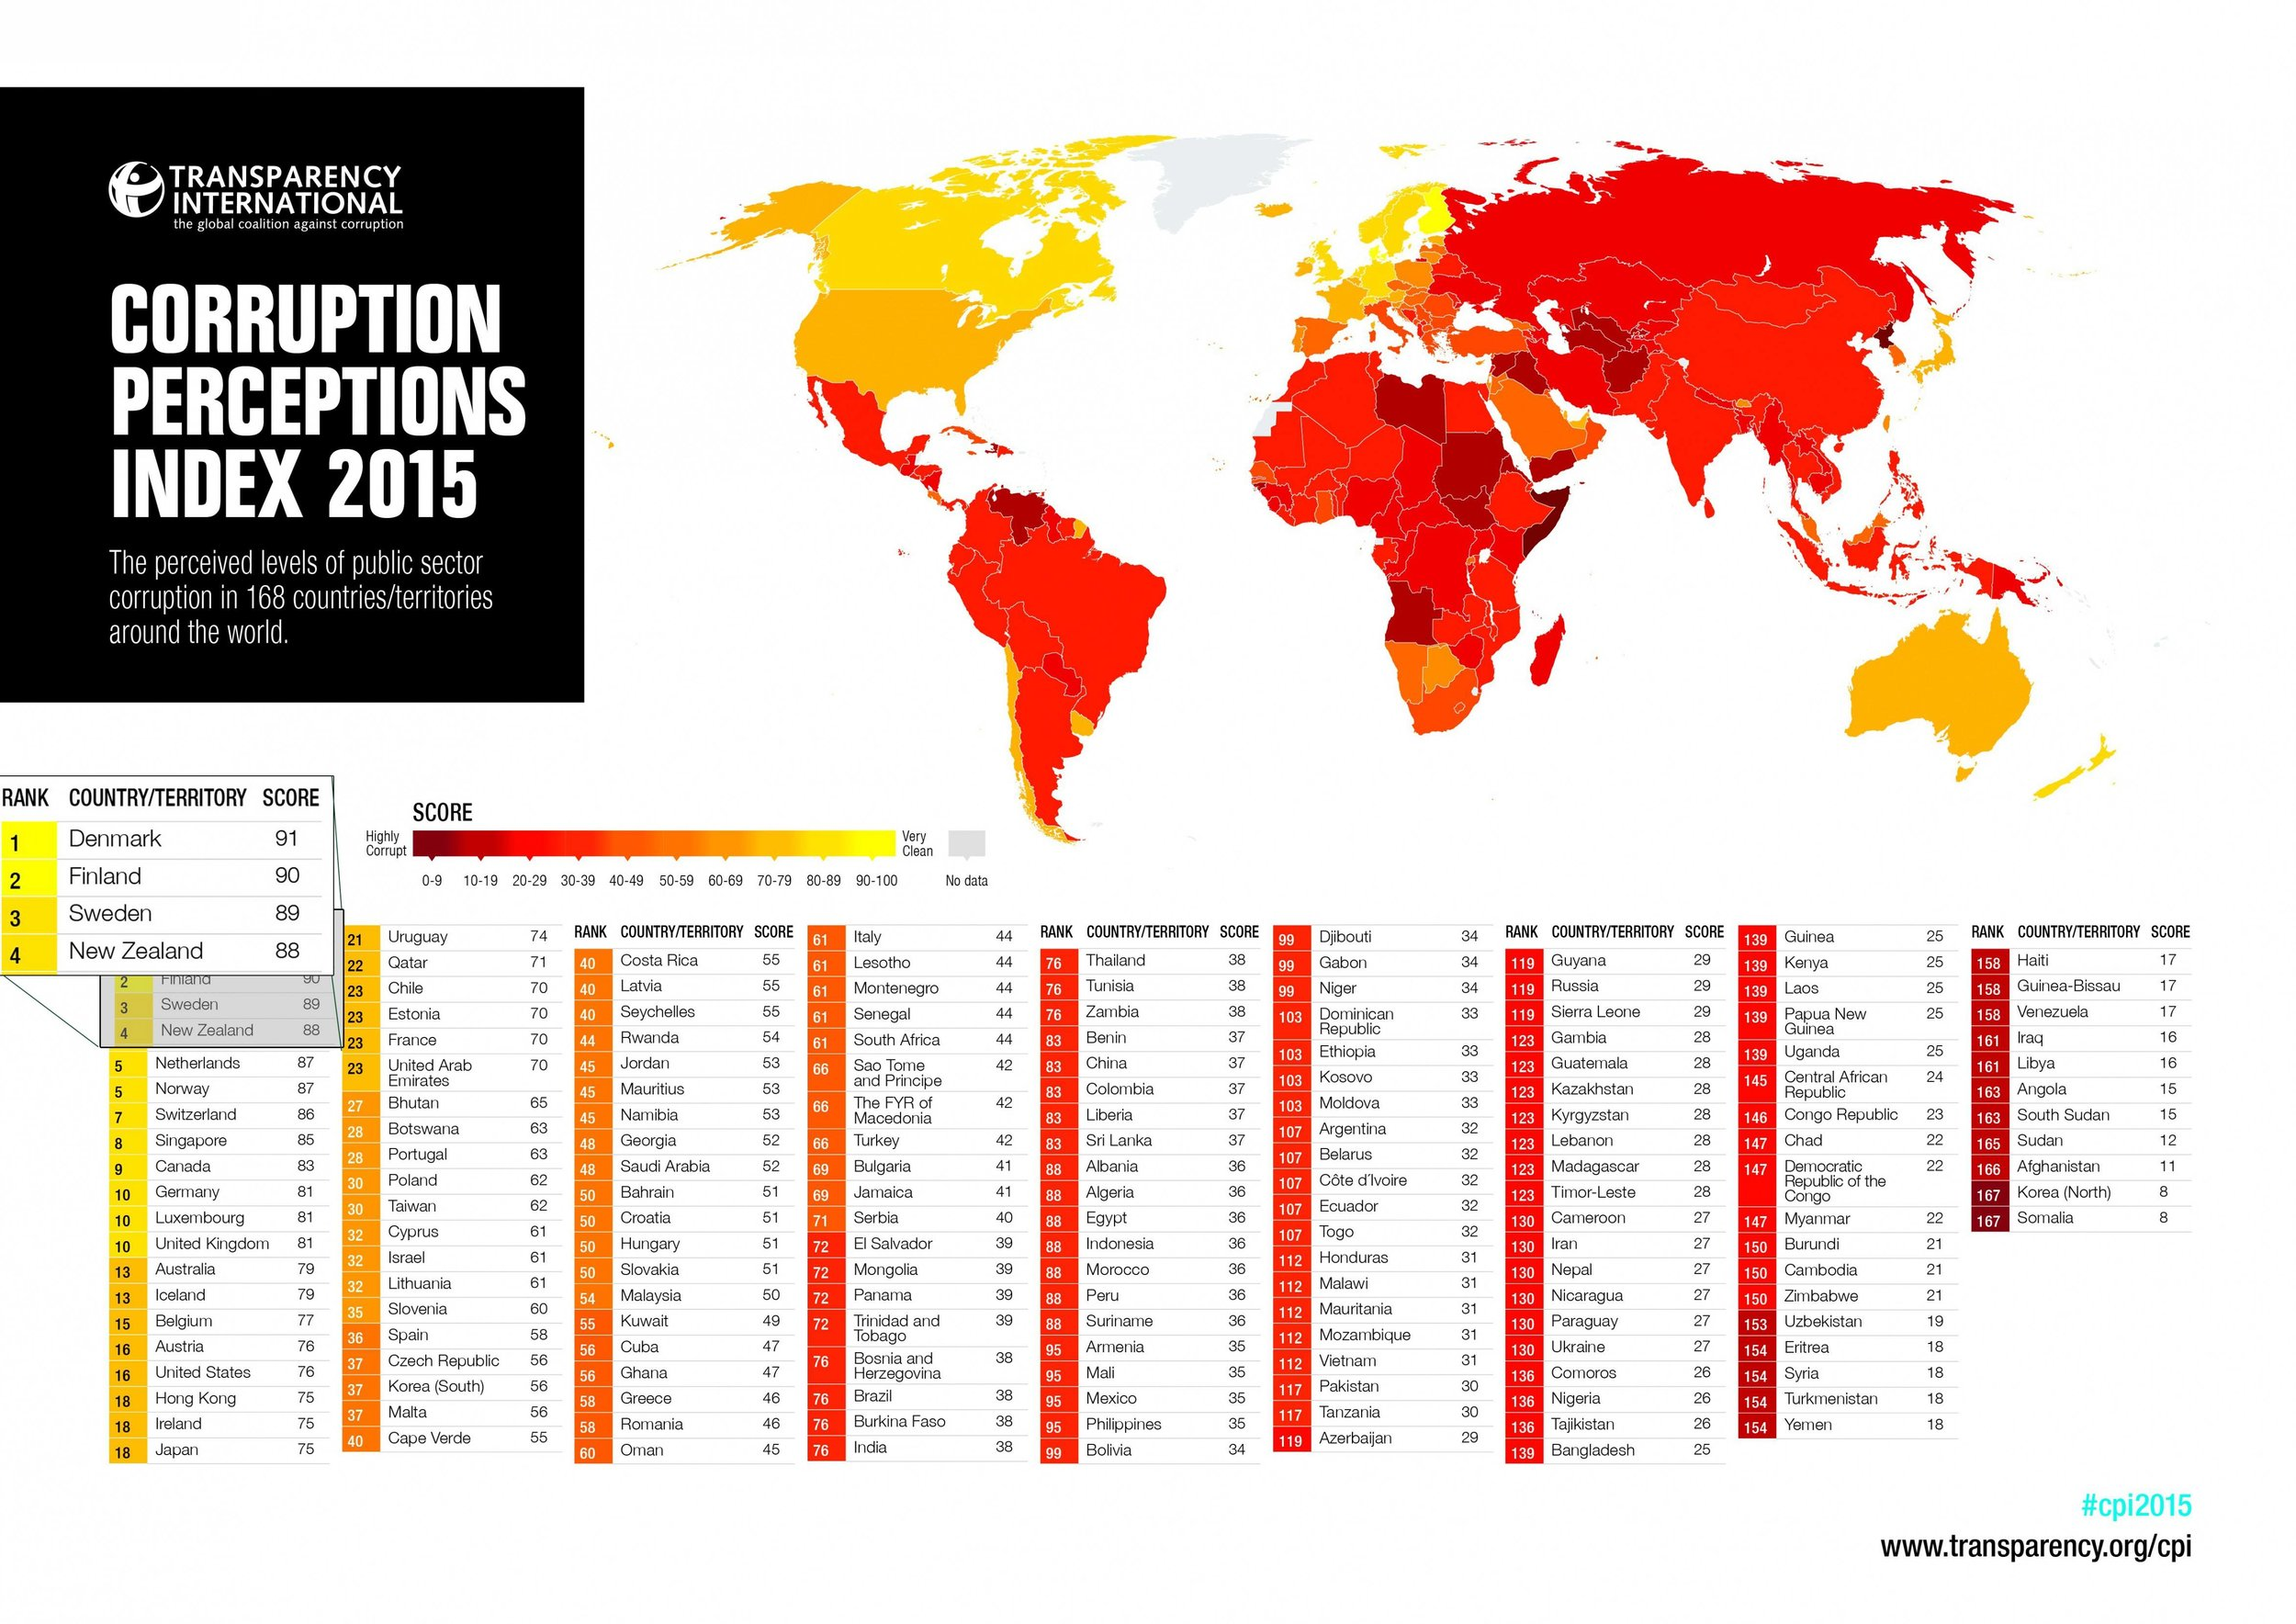 CorruptionMap.jpg